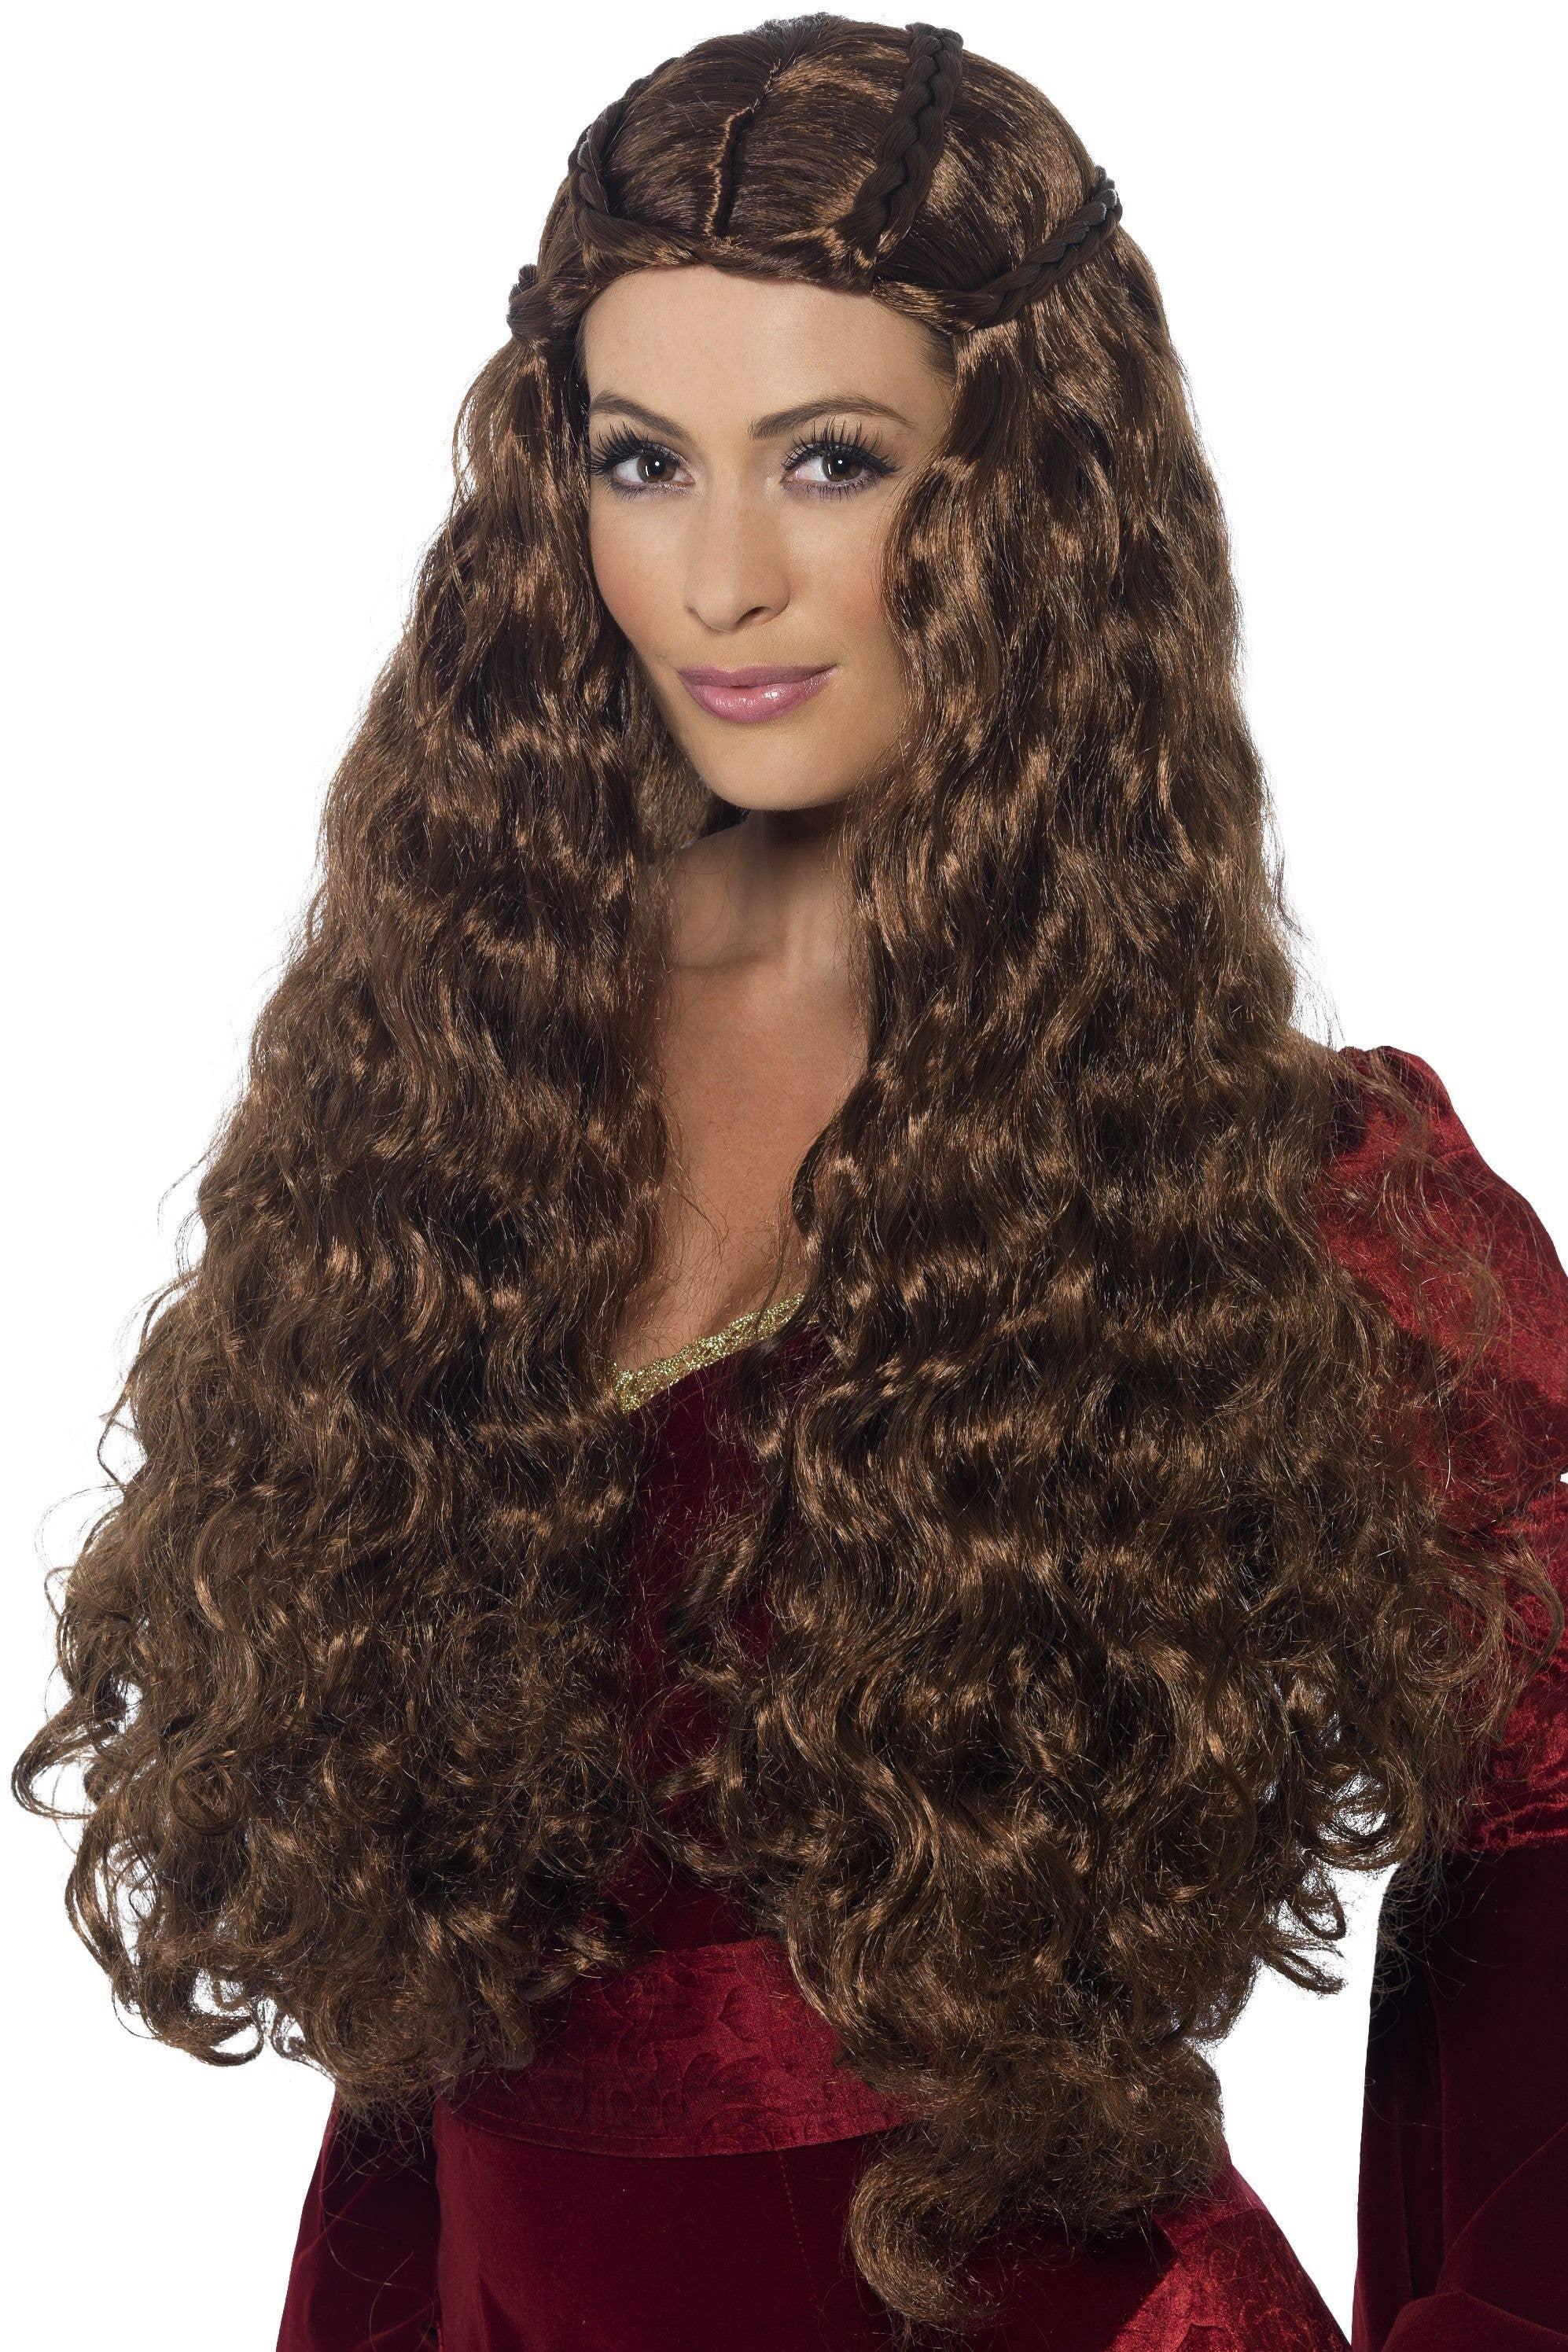 Medieval Princess Long Brown Curly Costume Wig Main Image 6089b6aeb